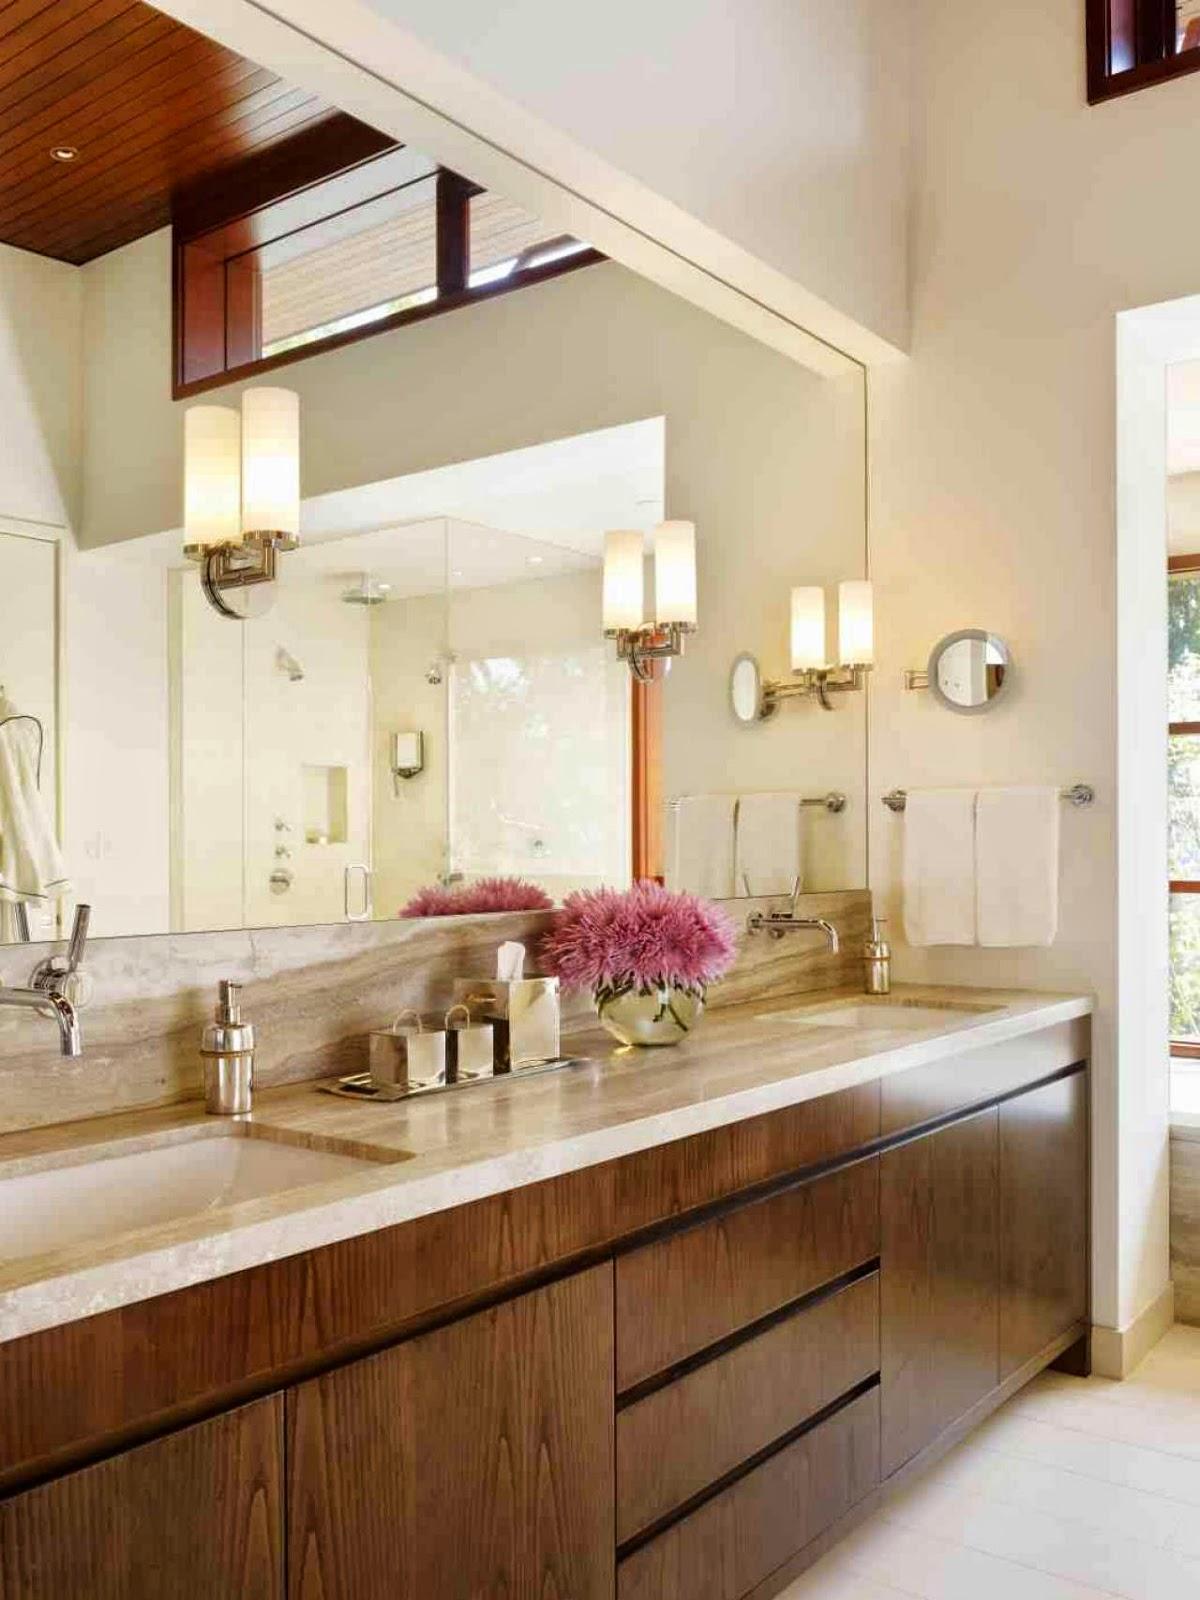 sconce mirror sconce mirror sconce dans le lakehouse rh danslelakehouse com Bathroom Mirrors with Sconces Attached Bathroom Mirrors with Sconces Attached